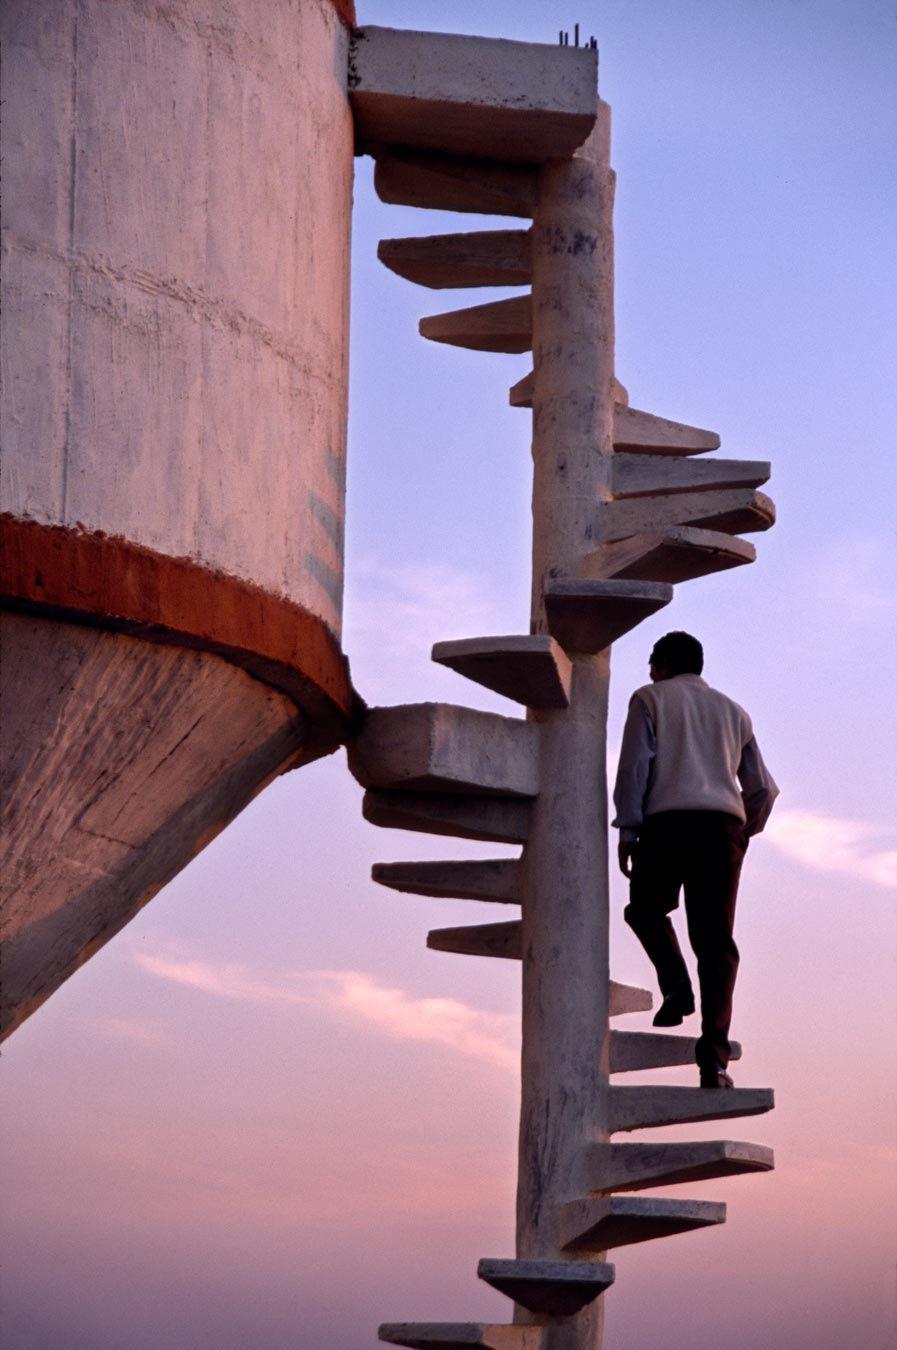 Upstairs, Downstairs | Steve McCurry